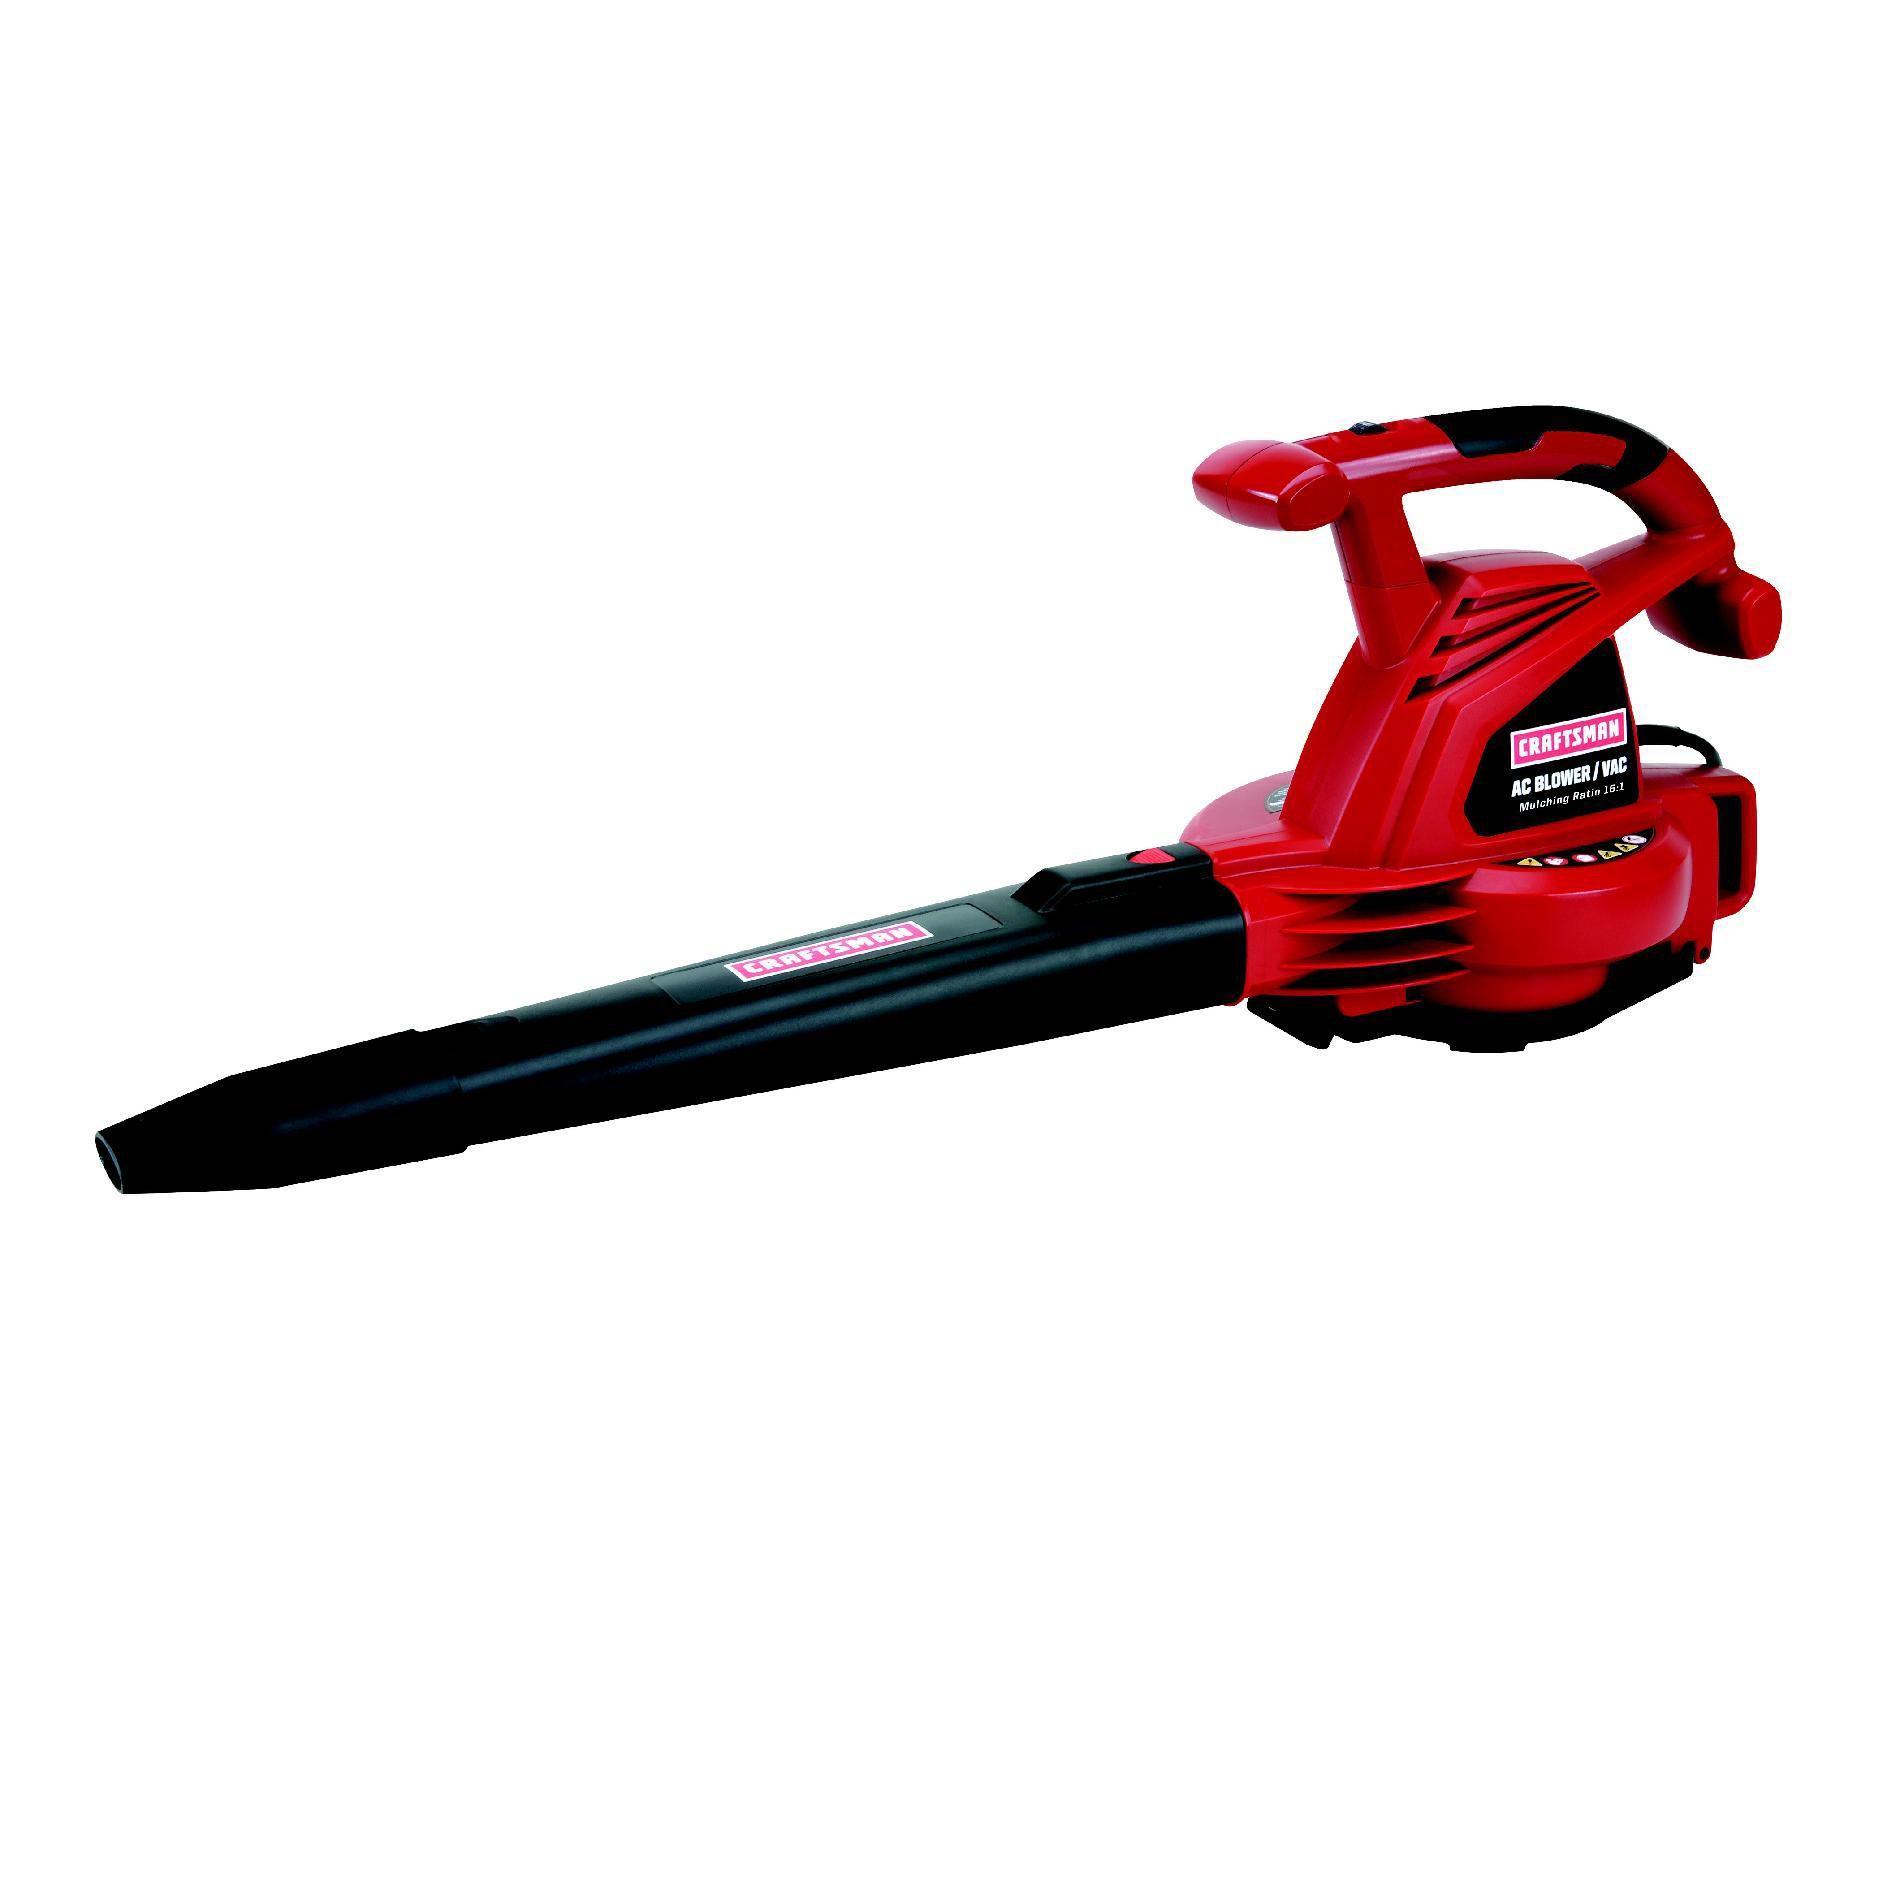 Craftsman Craftsman 12A Variable Speed Leaf Blower/Vac